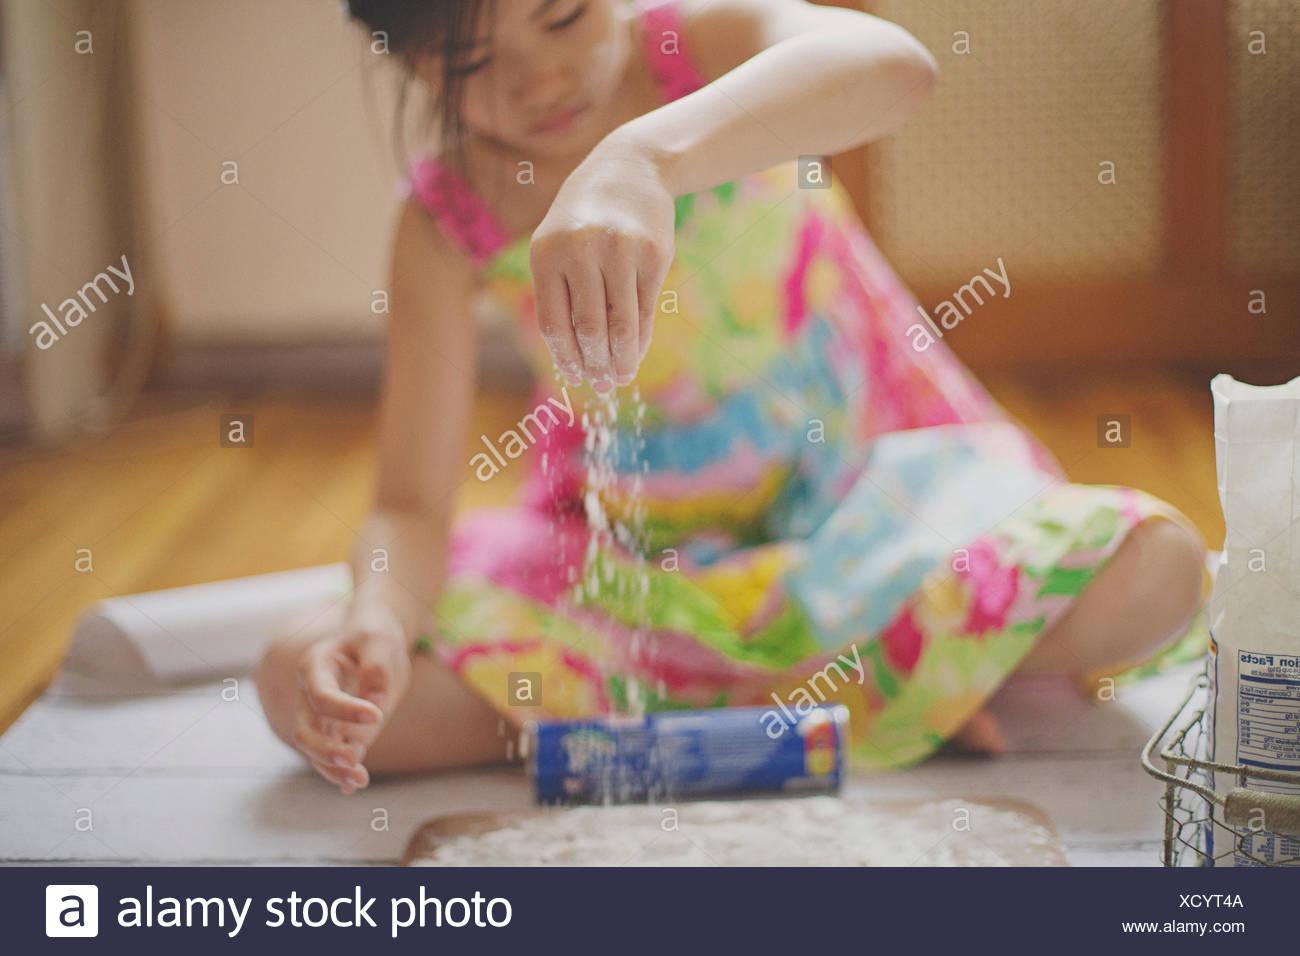 Girl sitting on the floor baking - Stock Image